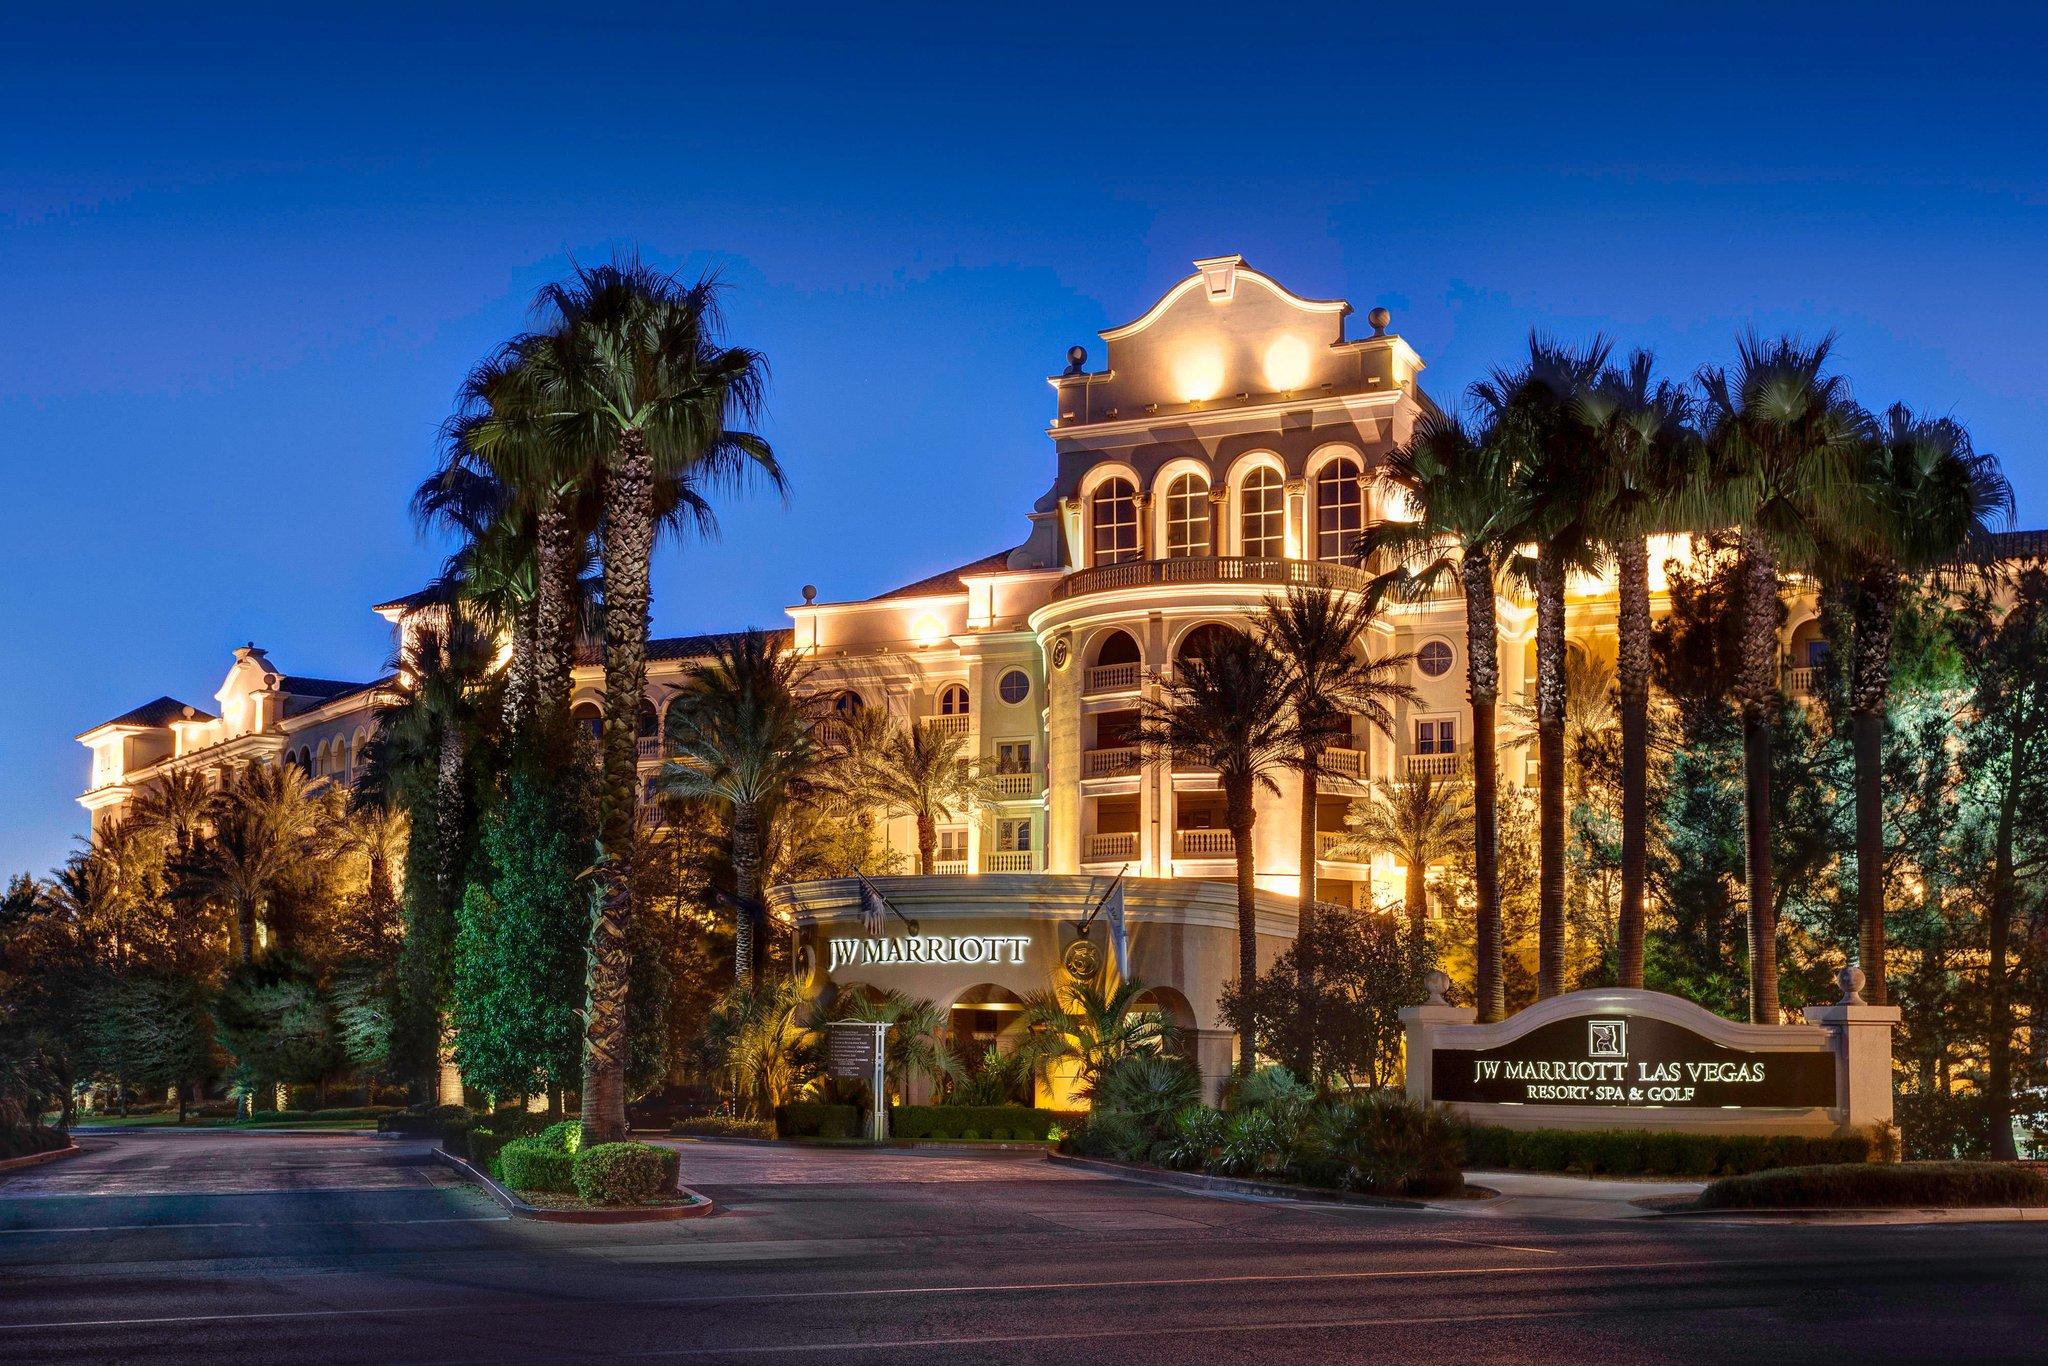 JW Marriott-Las Vegas Resort & Spa